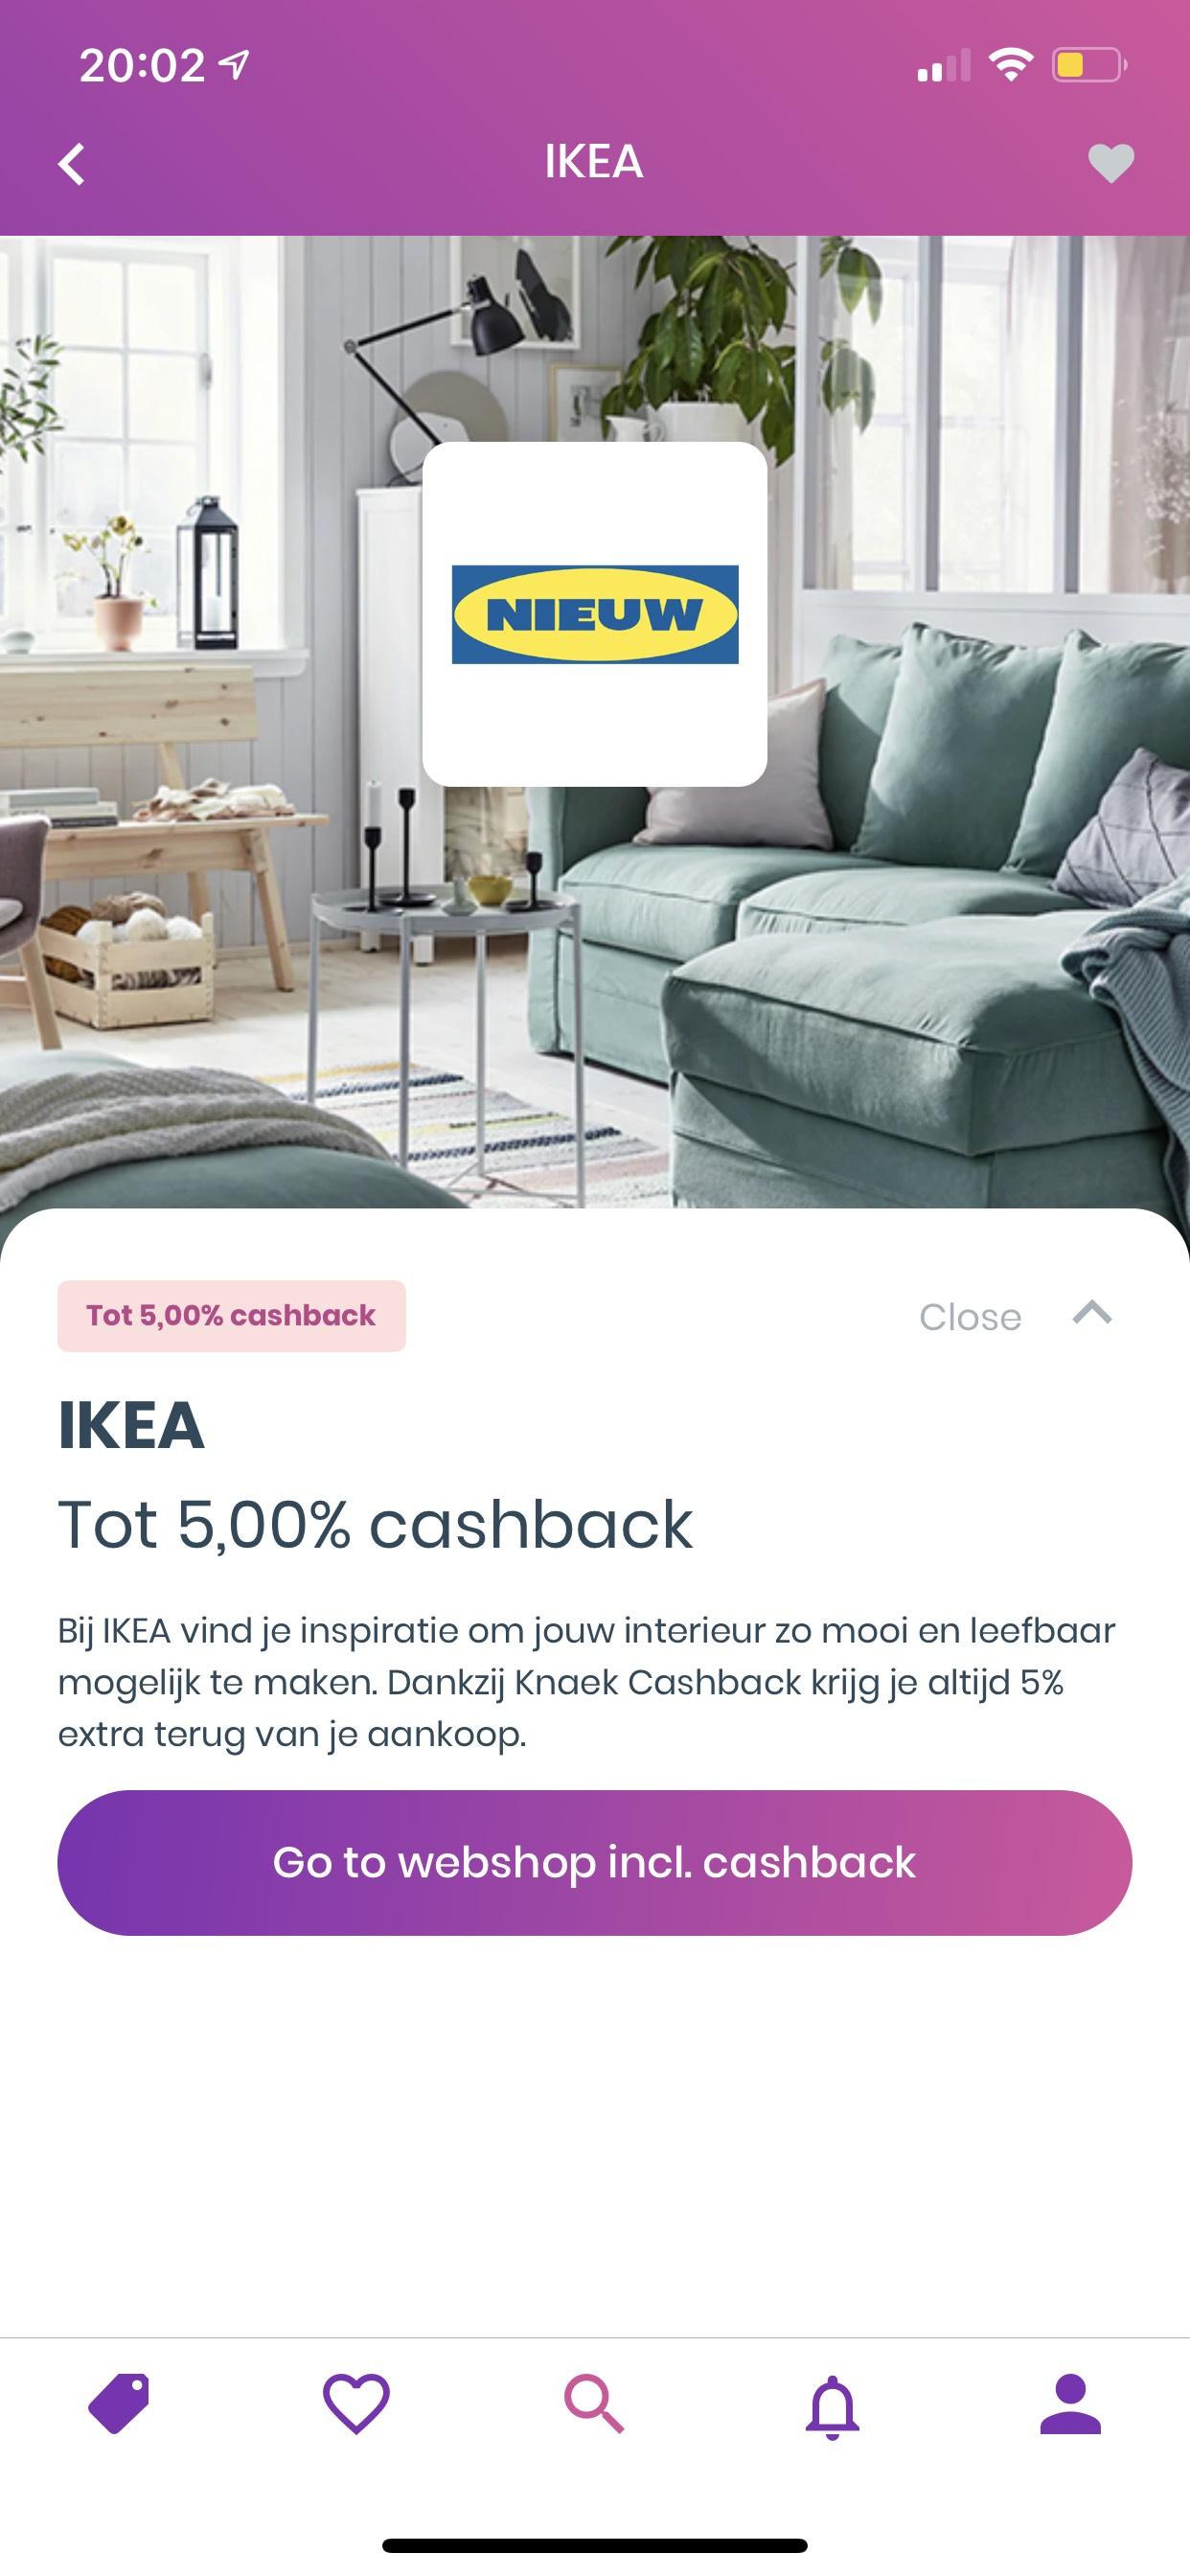 5% Cashback bij IKEA via Knaek Cashback